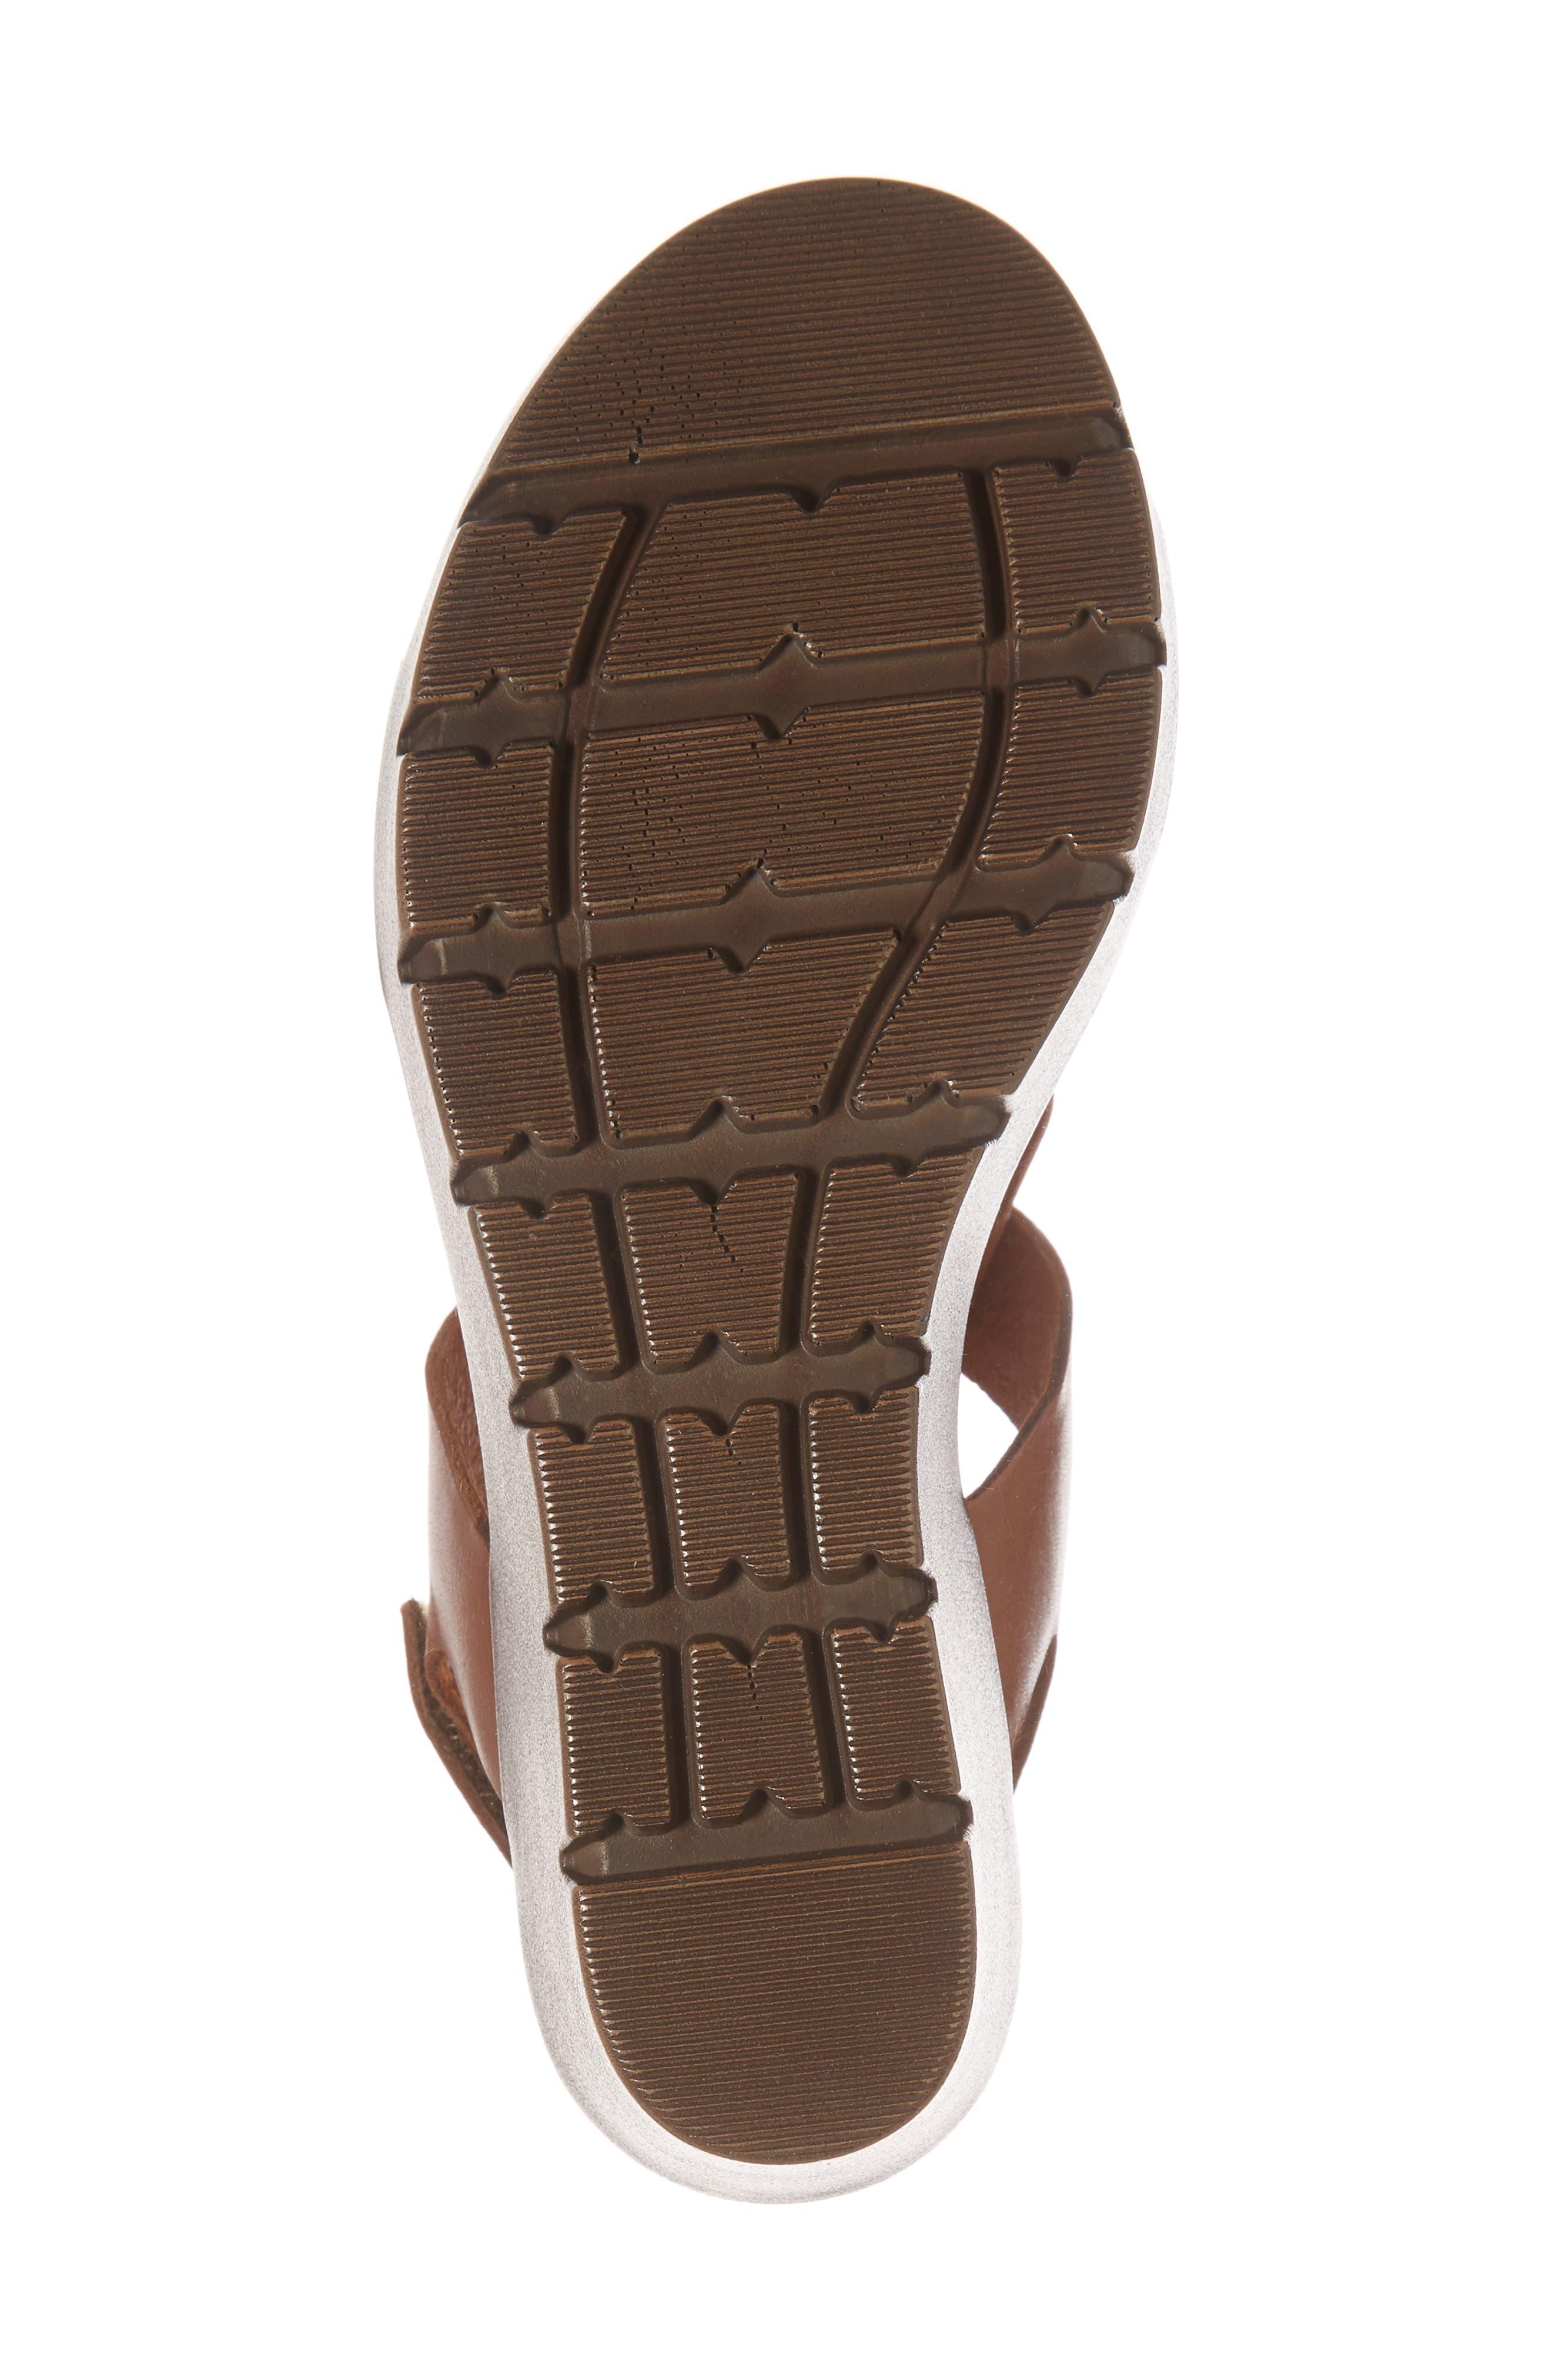 Somo Platform Wedge Sandal,                             Alternate thumbnail 6, color,                             Cognac/ Camel Leather